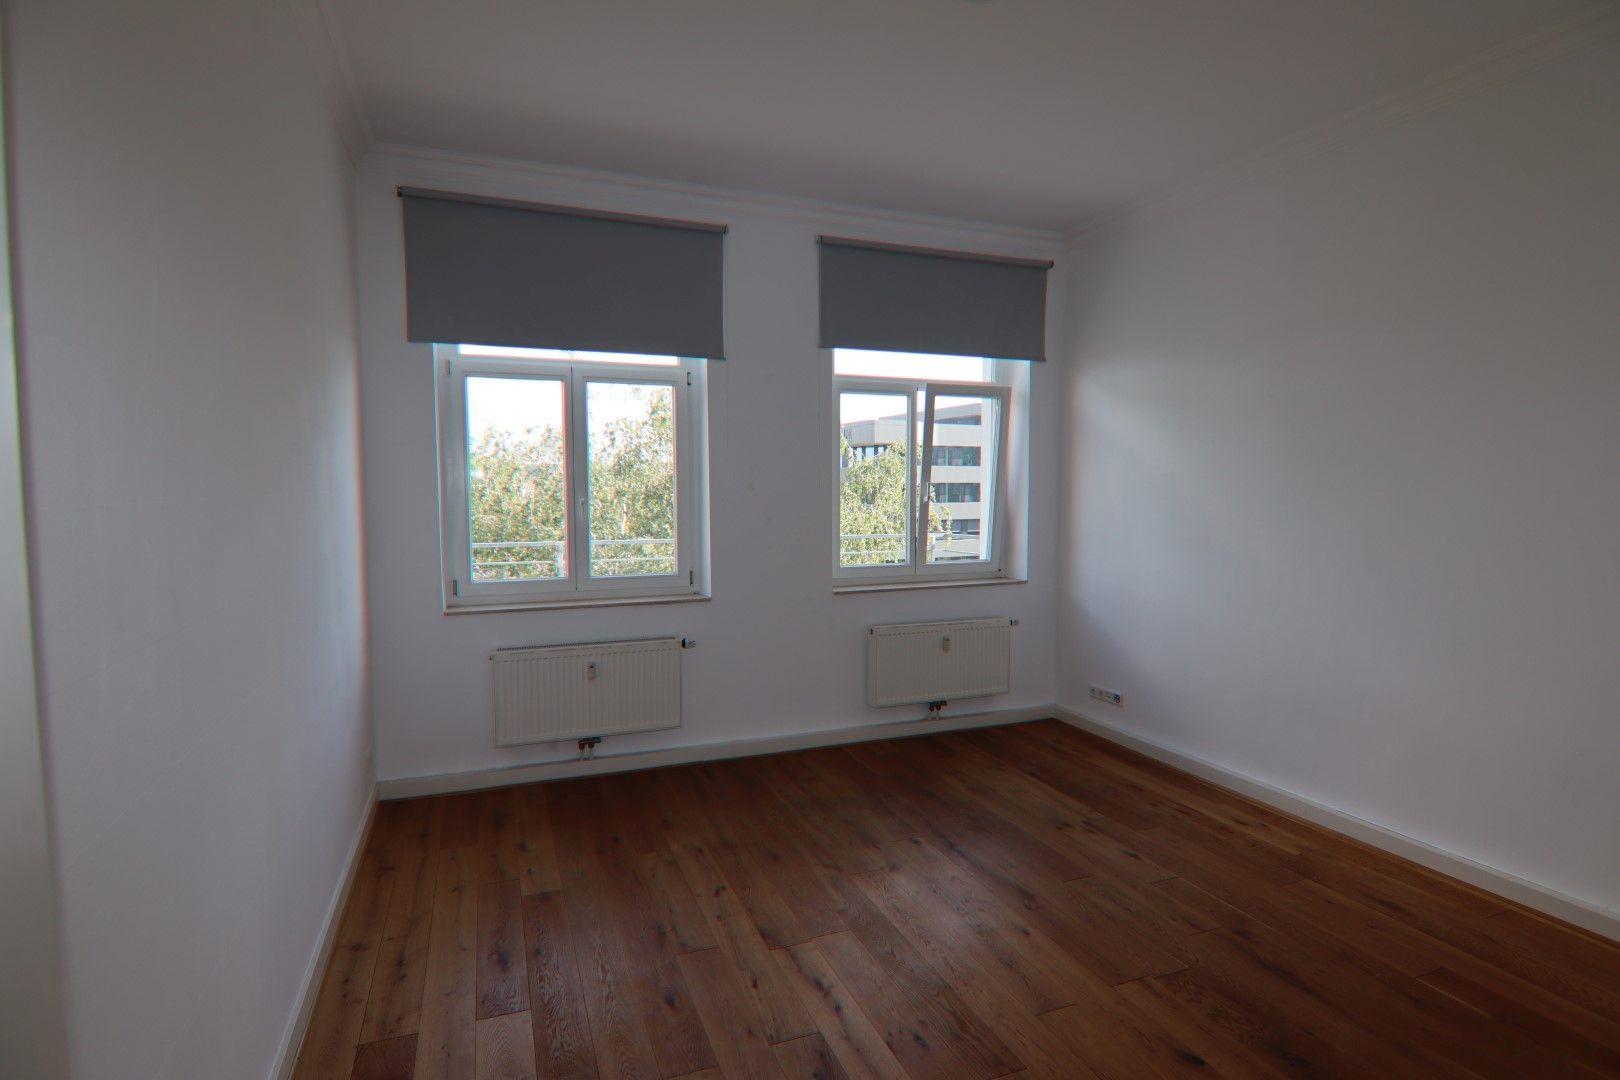 Immobilie Nr.0271 - 3-Zimmer-Altbauwohnung mit Aufzug im 3.OG - Bild 2.jpg